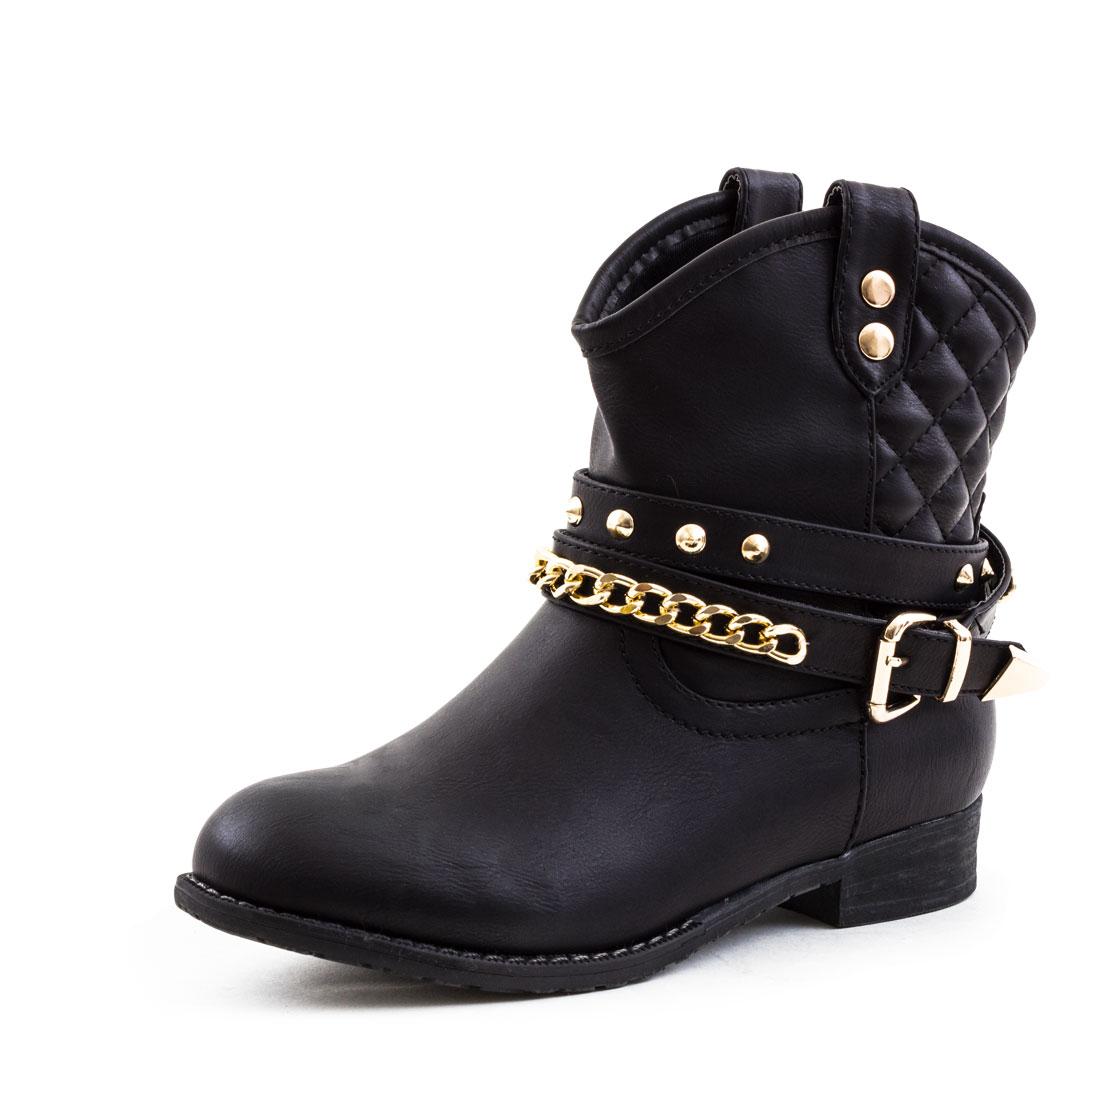 neu damen western cowboy stiefeletten worker boots schuhe 36 37 38 39 40 41 ebay. Black Bedroom Furniture Sets. Home Design Ideas